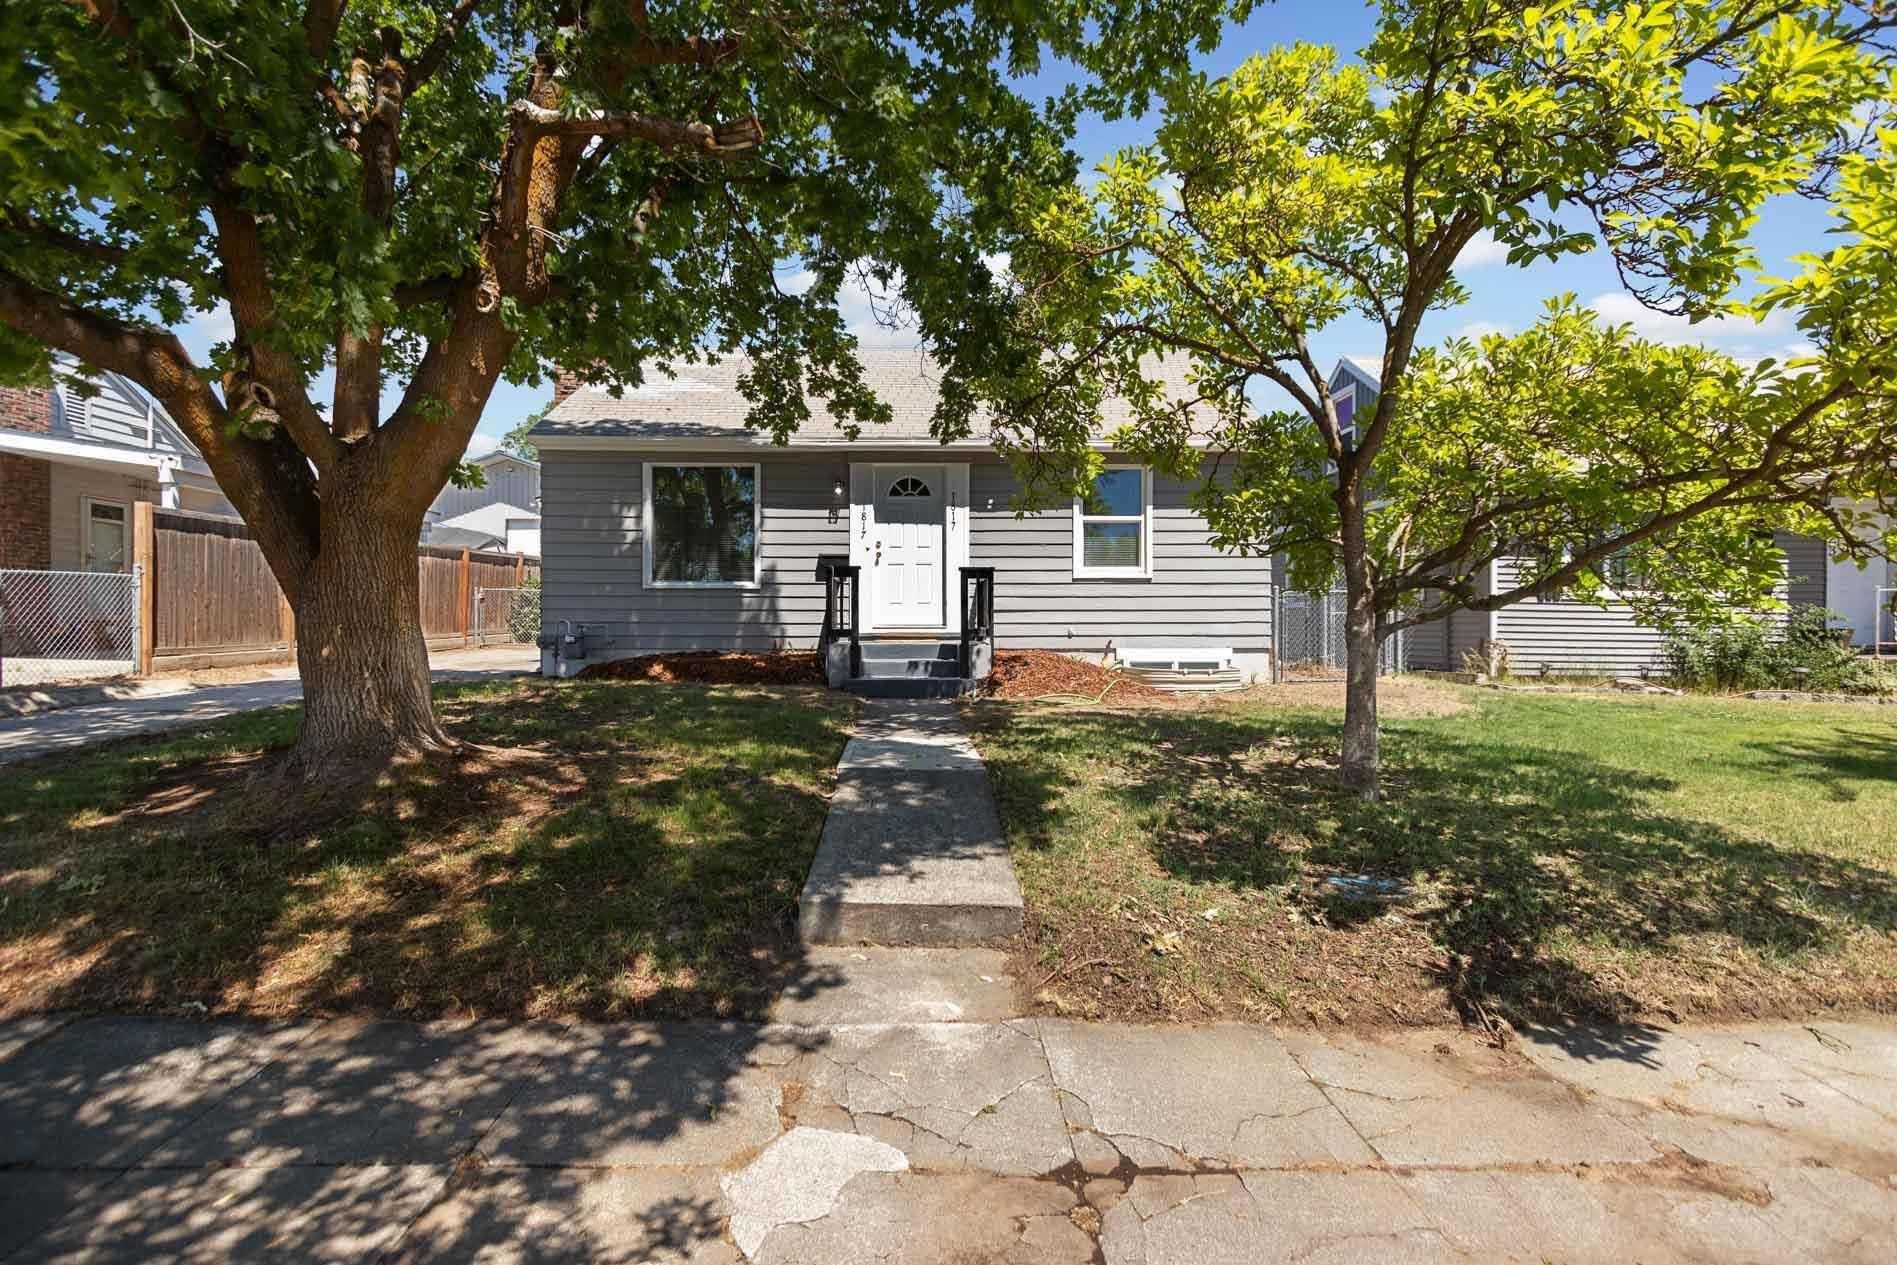 1817 E Courtland Ave, Spokane, WA 99207 - #: 202118118